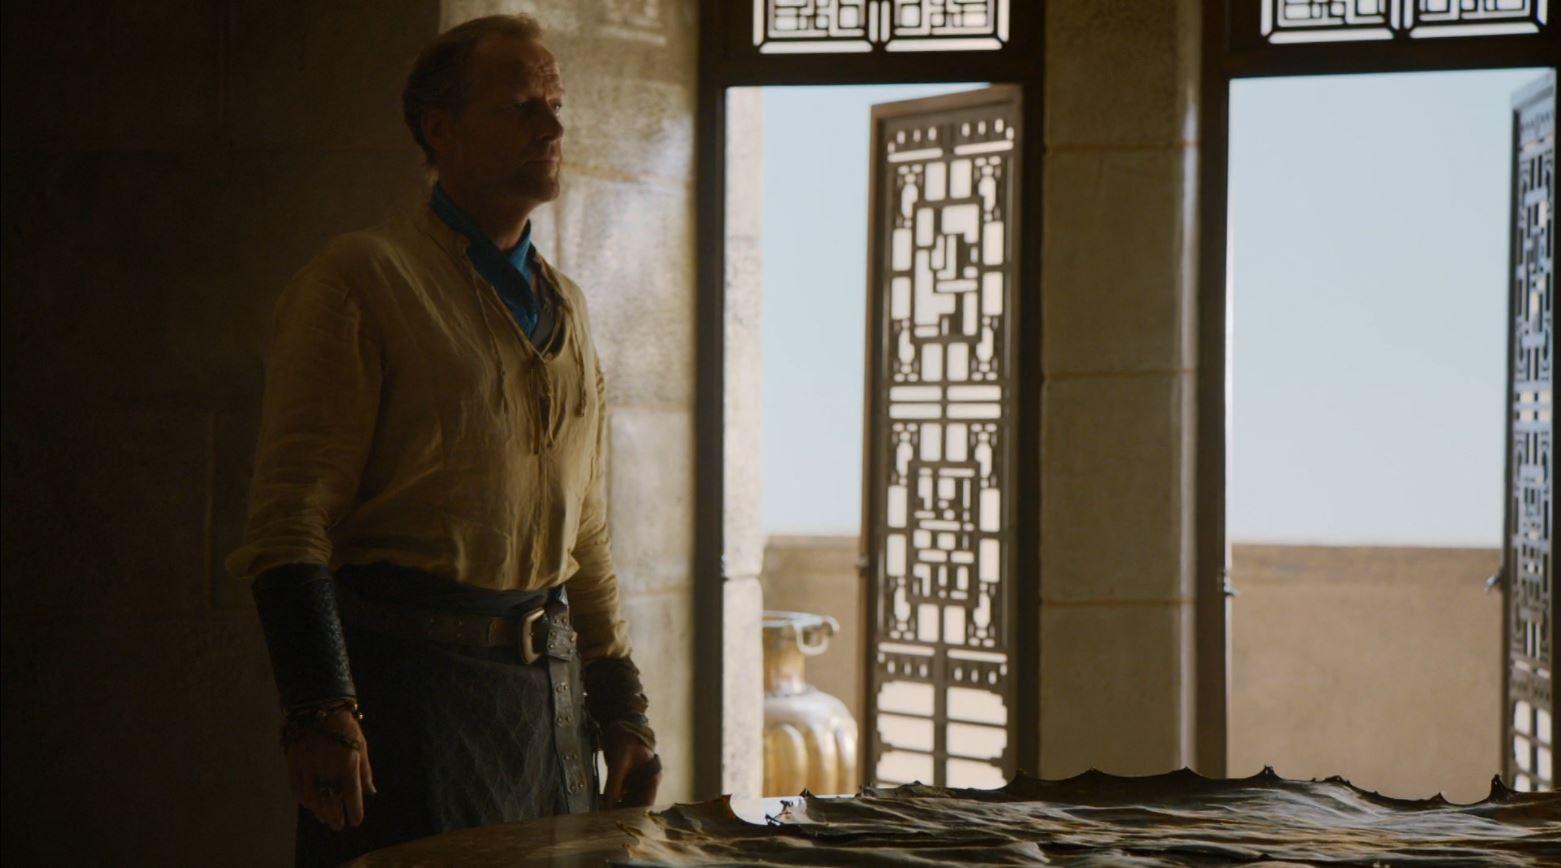 Game Of Thrones S4Ep7 Mockingbird Review - Iain Glen as Jorah Mormont confronting Daenarys